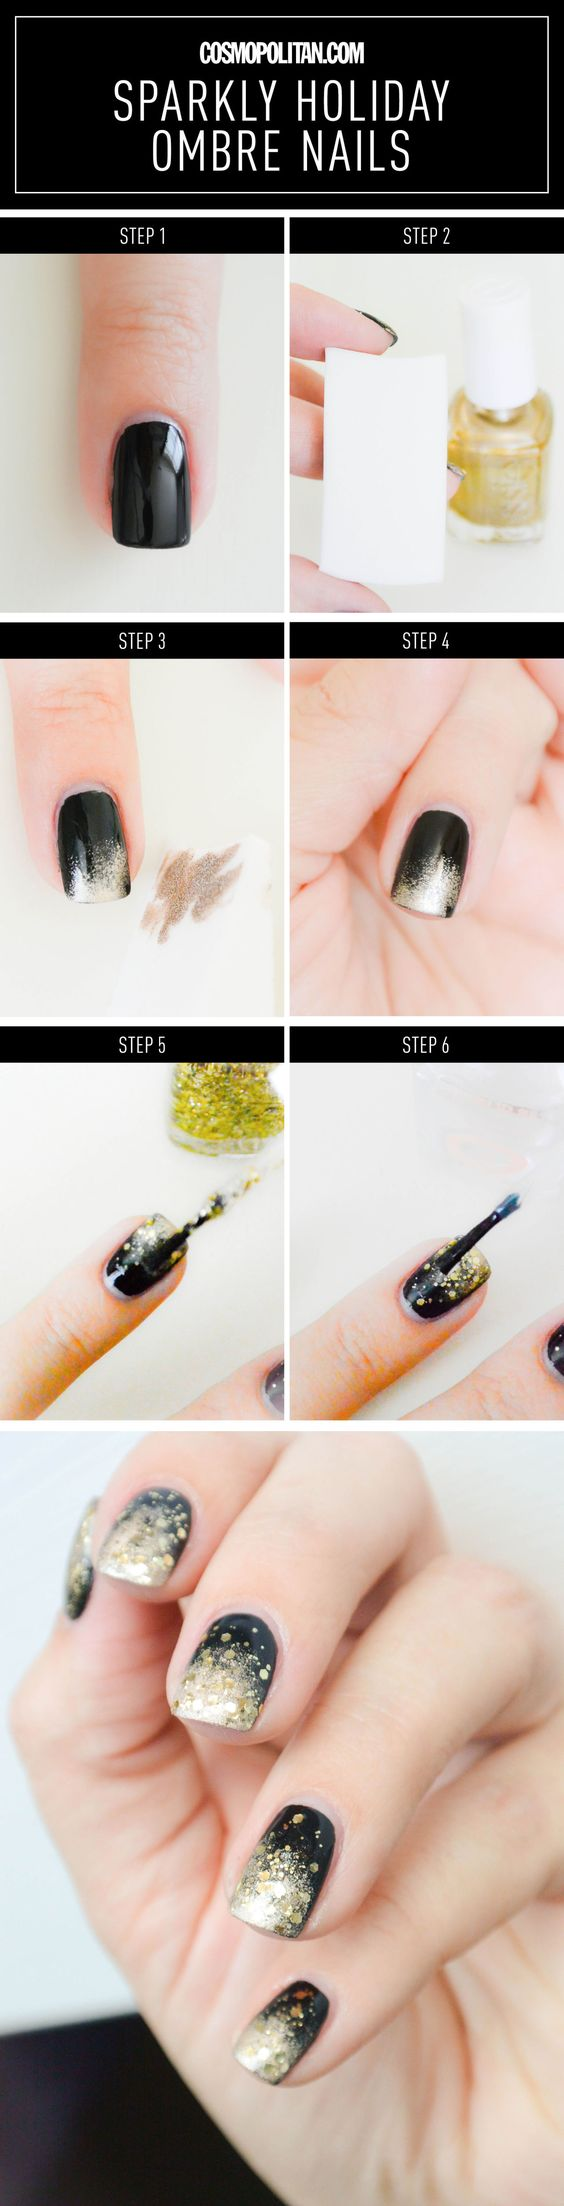 black-nails-with-glitter via